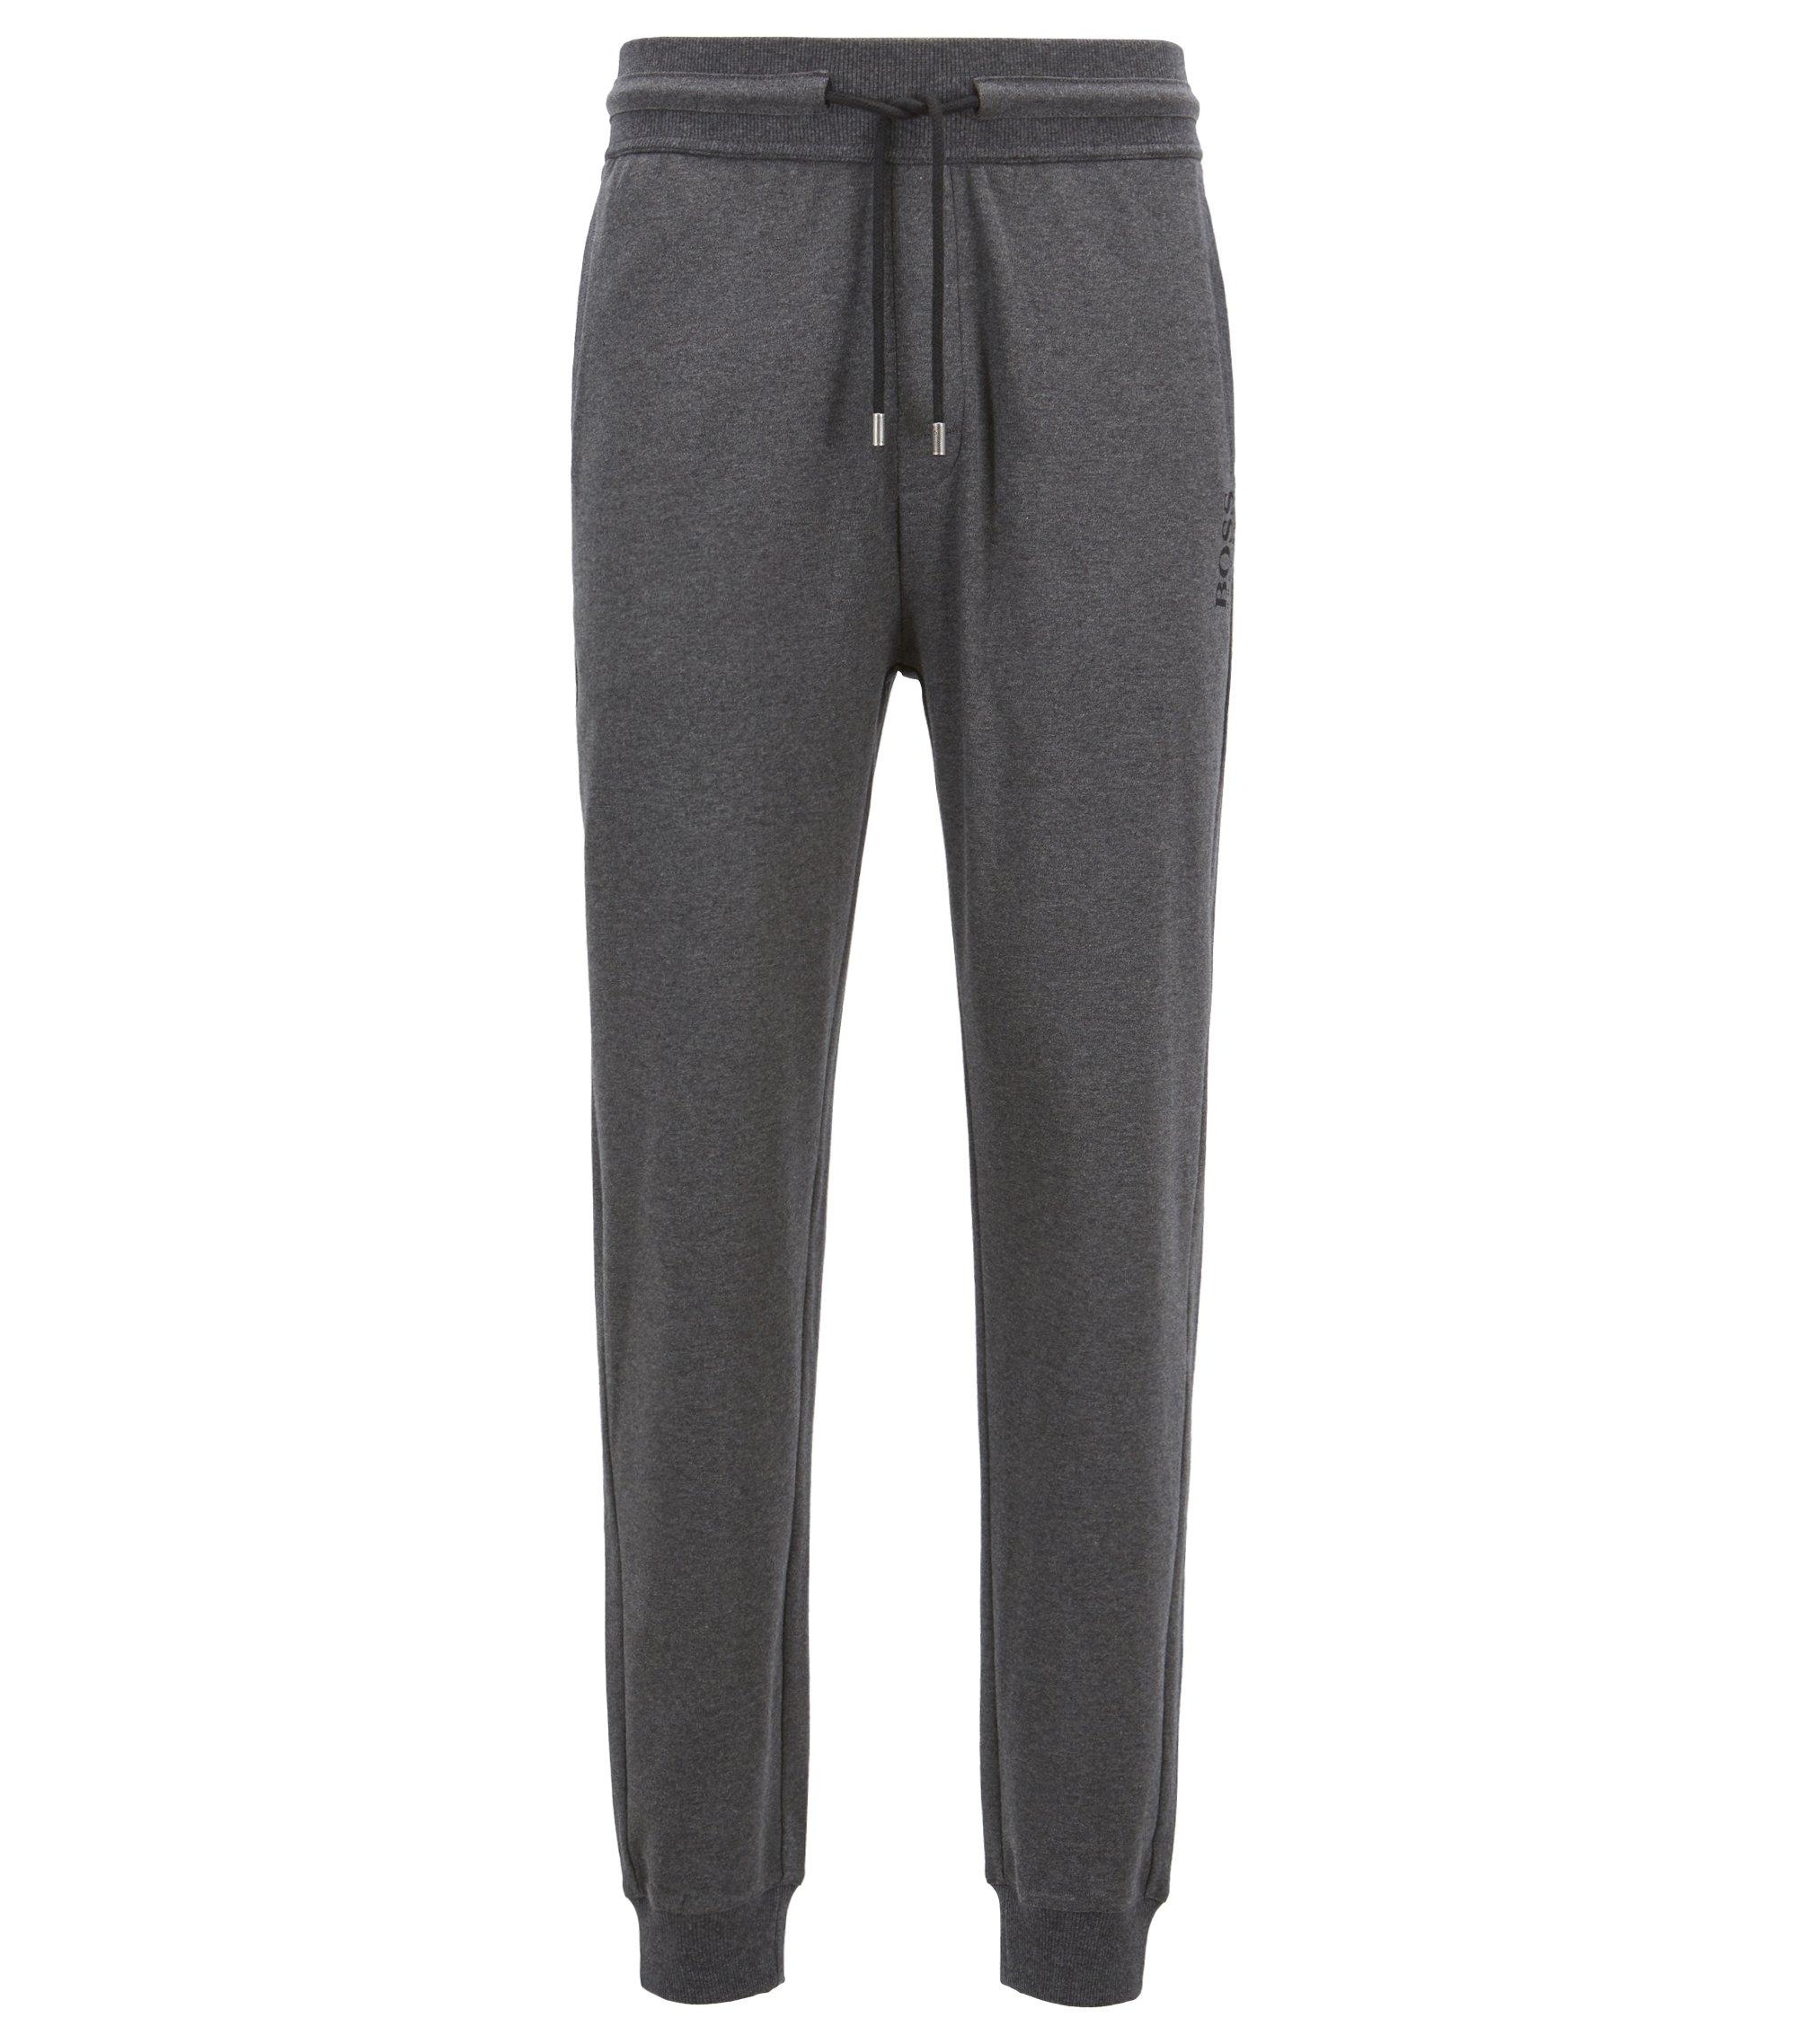 Regular-rise loungewear bottoms in cotton with drawstring waist, Grey